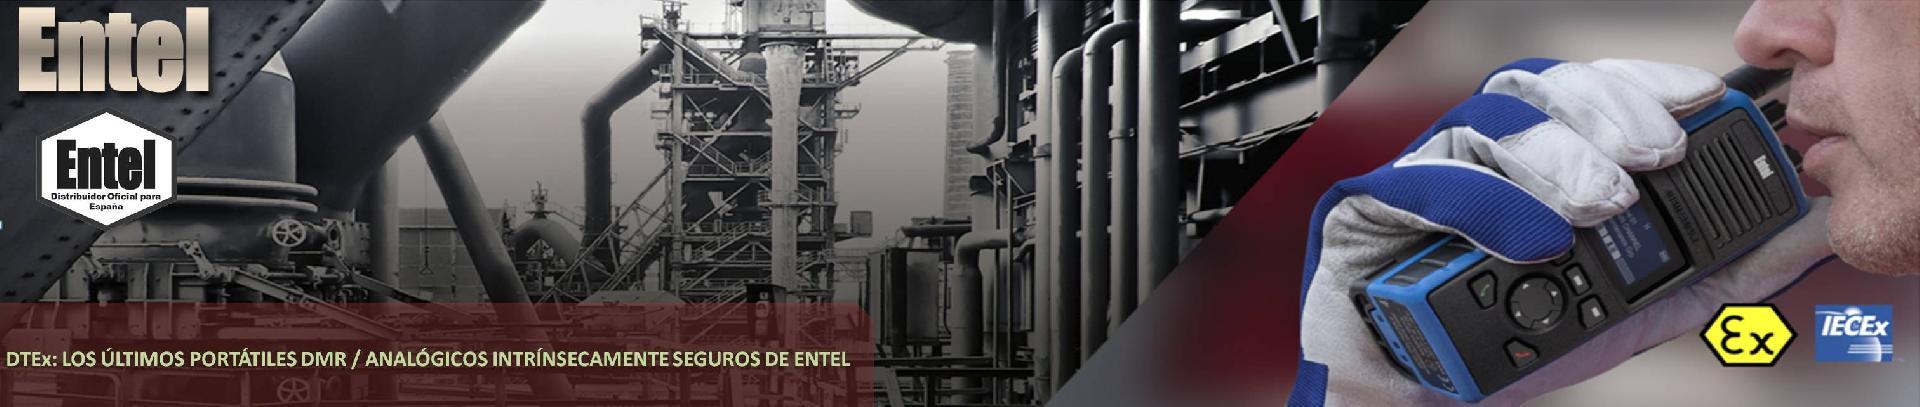 ENTEL DT